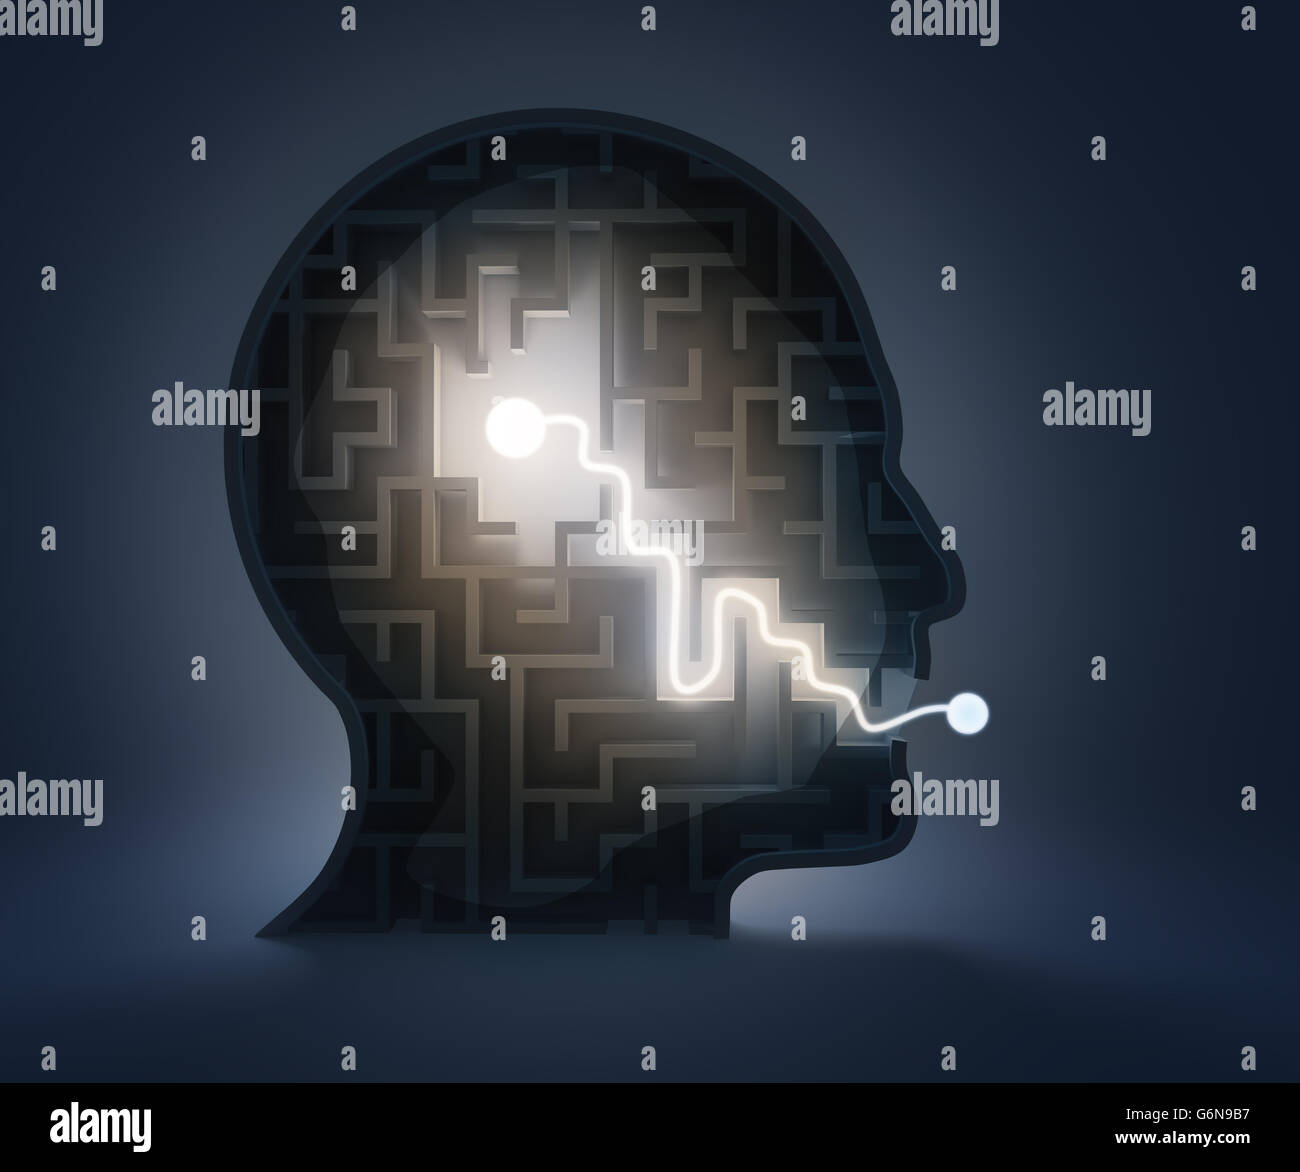 Maze inside a head - from brain to speech - Stock Image